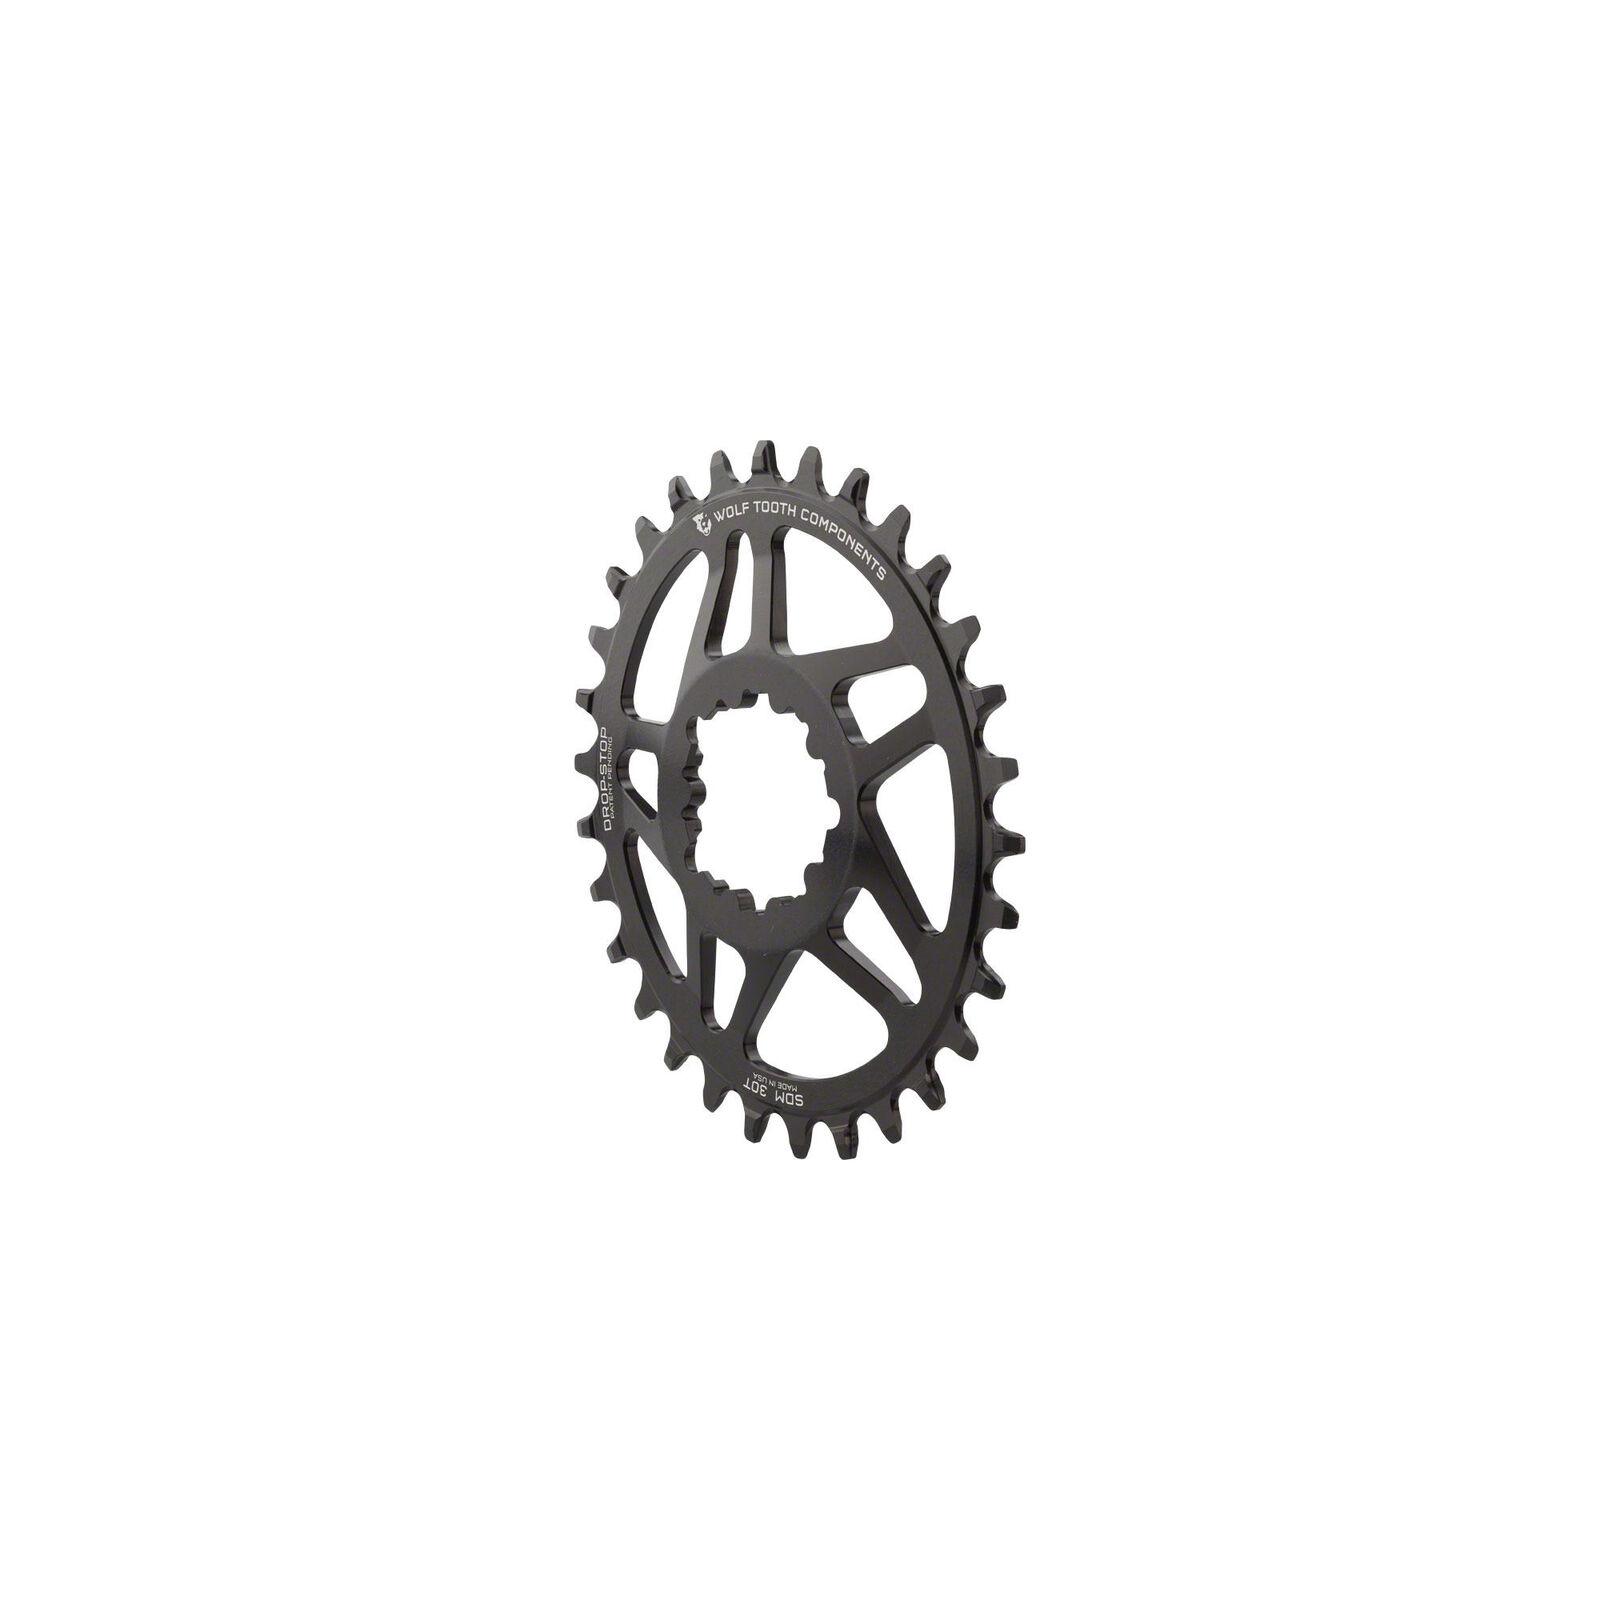 Componentes de diente lobo Drop-Stop Powertrac dm 30t PLATO BB30 0mm Offset